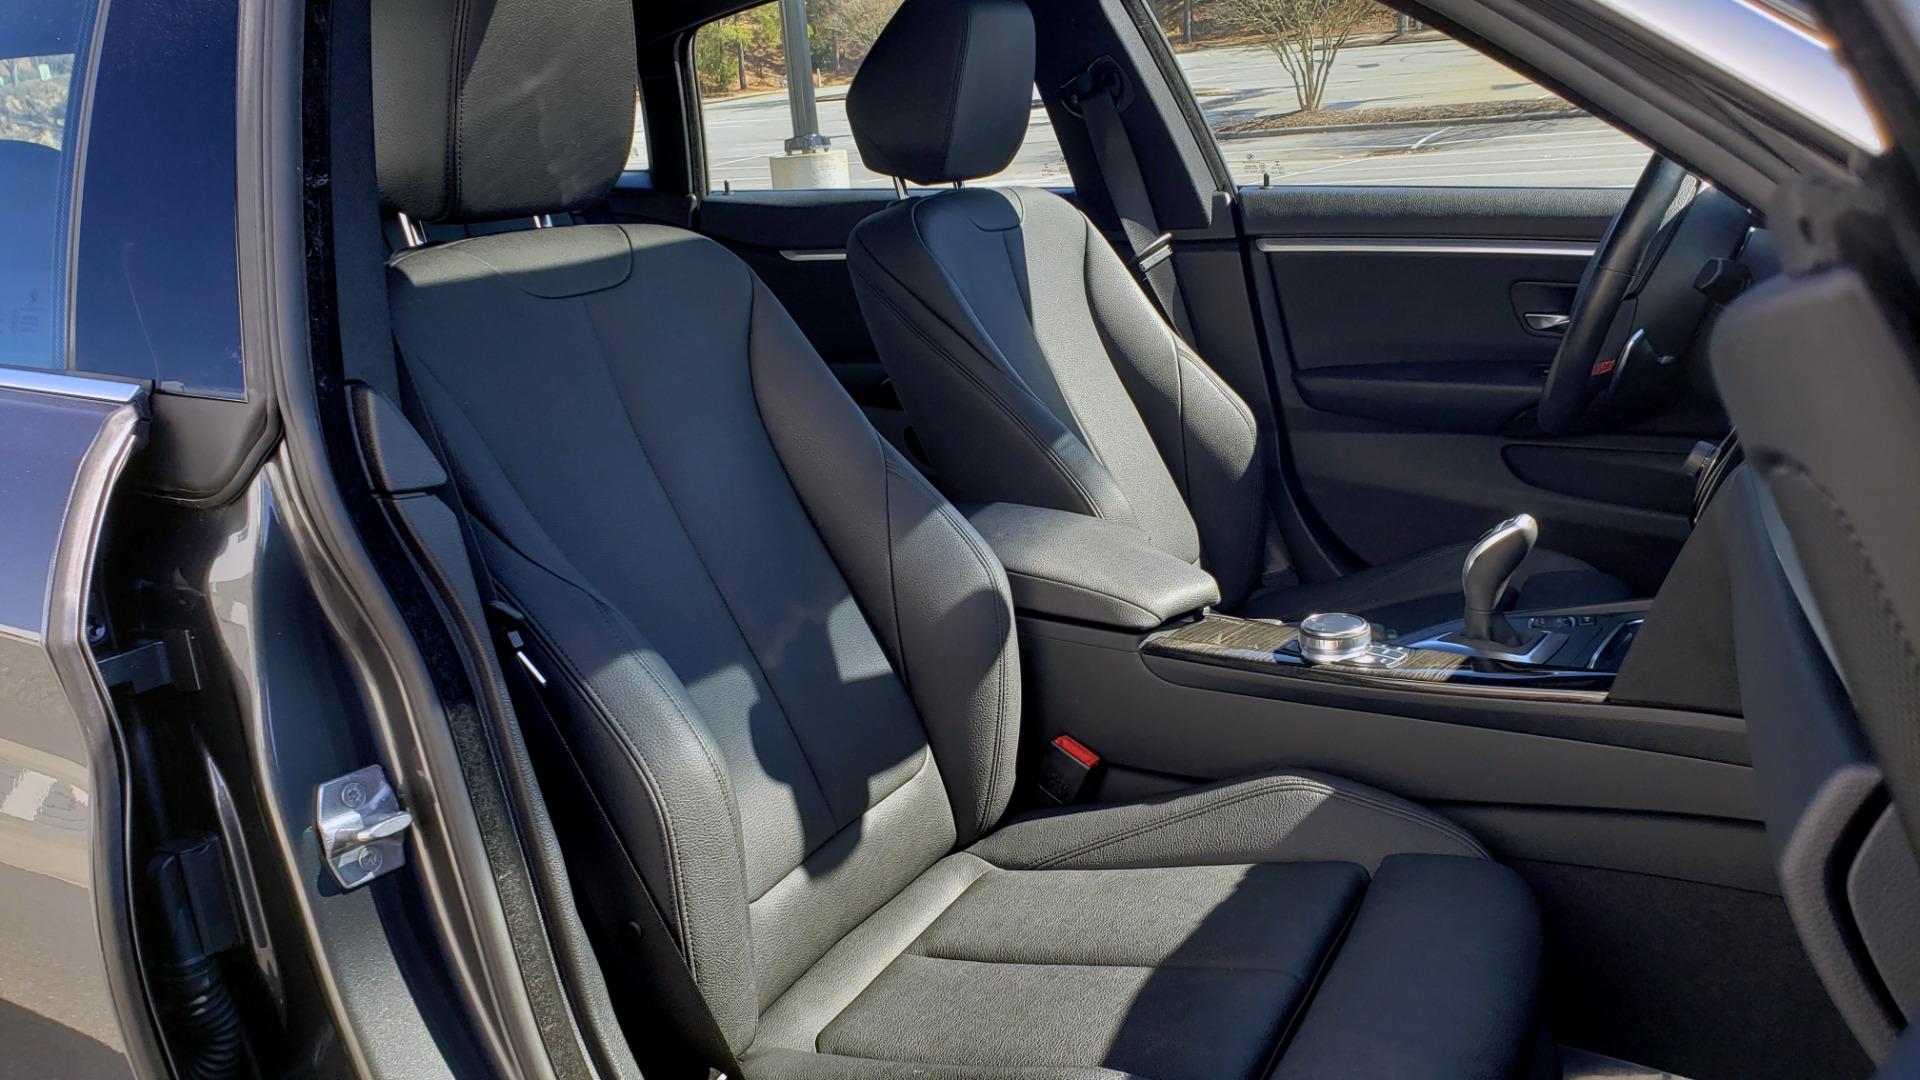 Used 2018 BMW 4 SERIES 430IXDRIVE / PREMIUM / NAV / SUNROOF / ESSENTIALS PKG for sale $29,495 at Formula Imports in Charlotte NC 28227 66